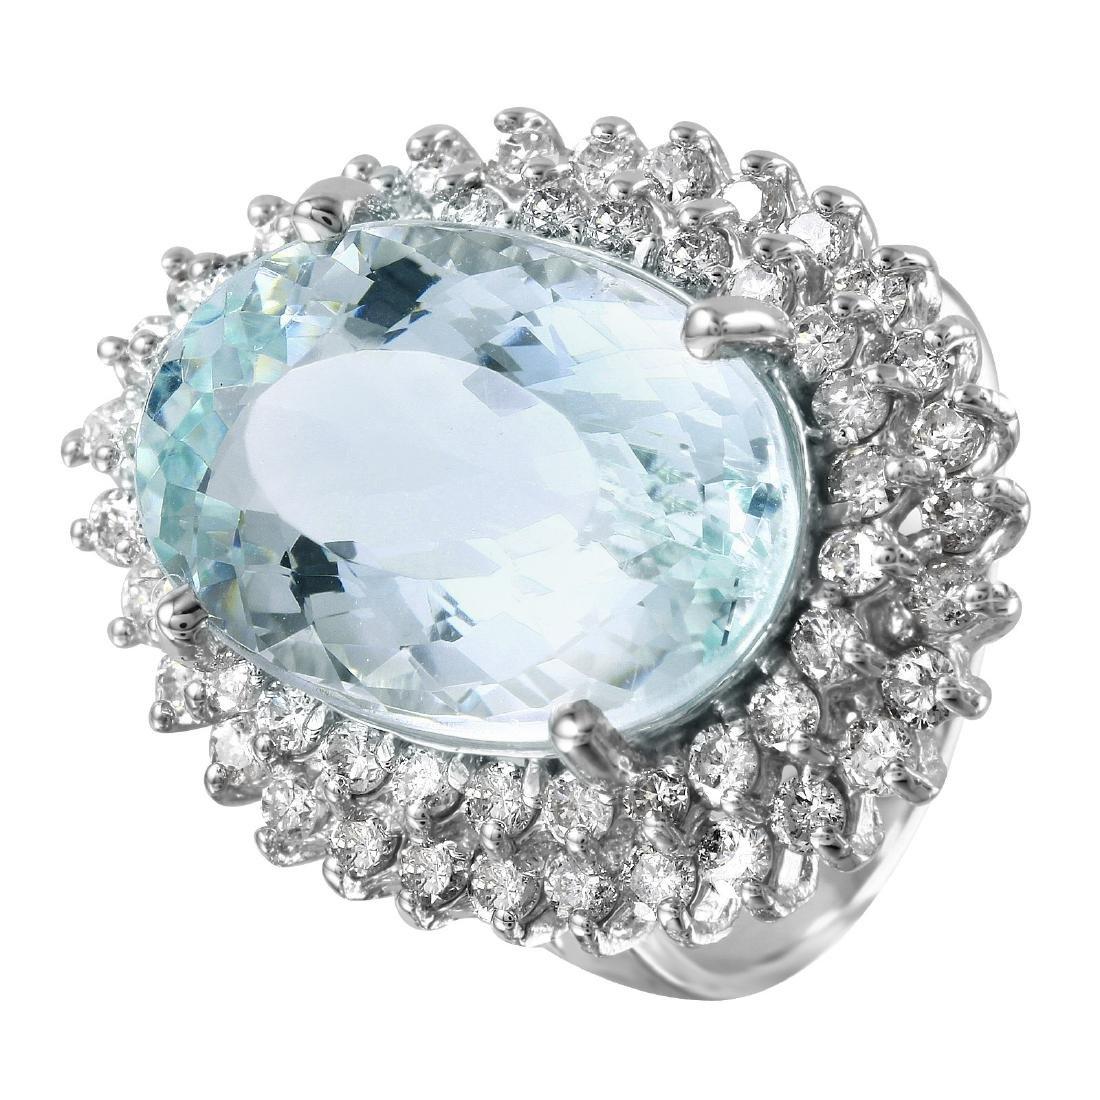 14KT White Gold 11.1ctw Aquamarine Diamond Cocktail - 5